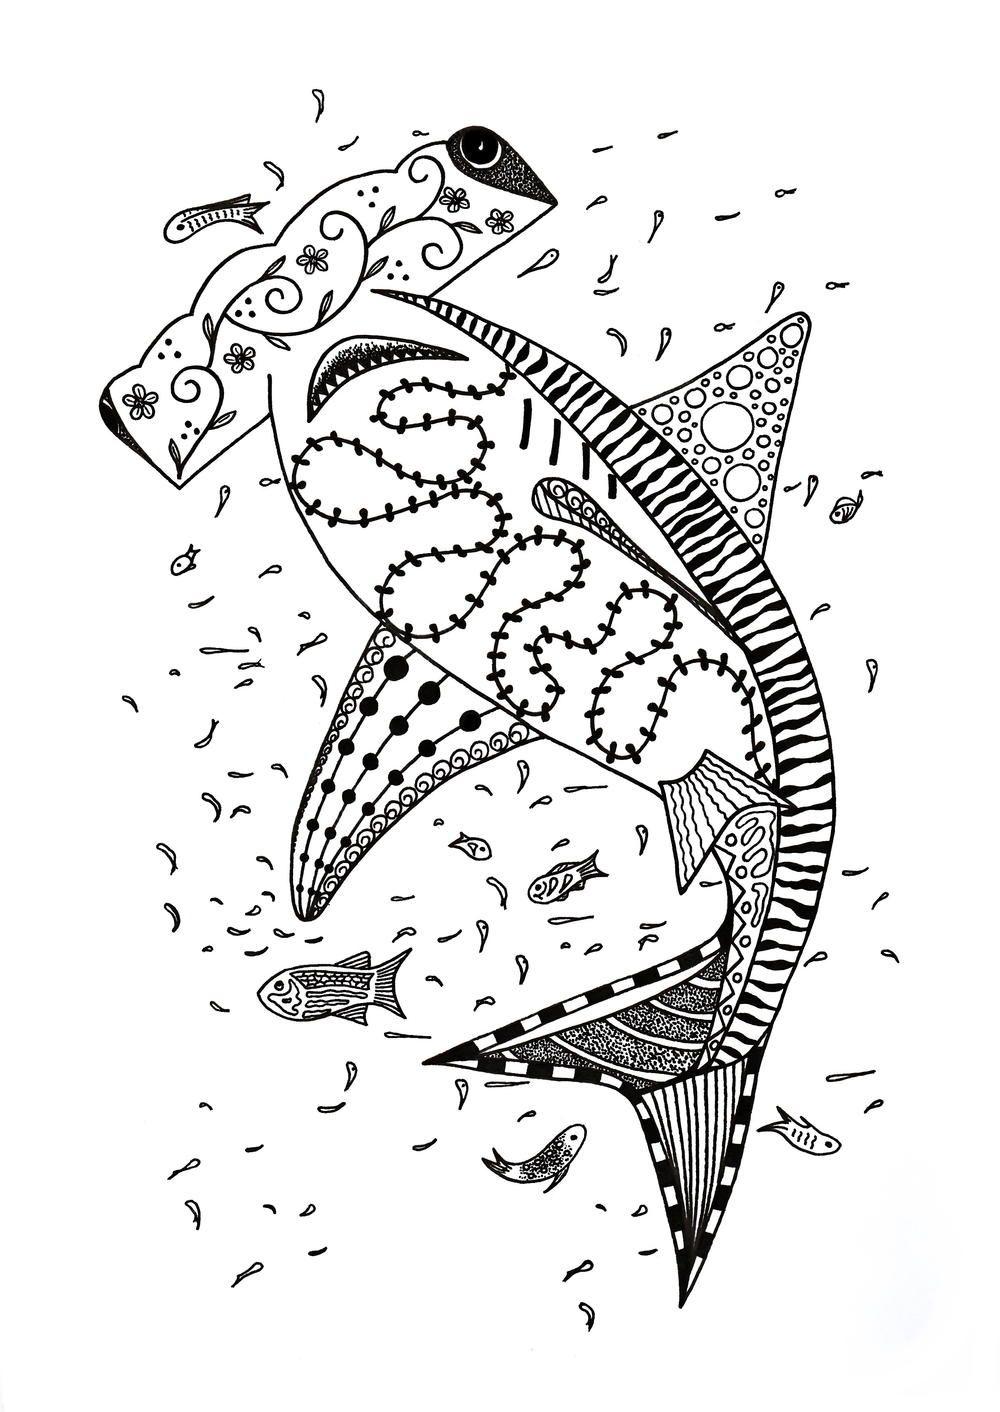 Hammerhead Shark Coloring Page Shark Coloring Pages Coloring Pages For Kids Coloring Pages